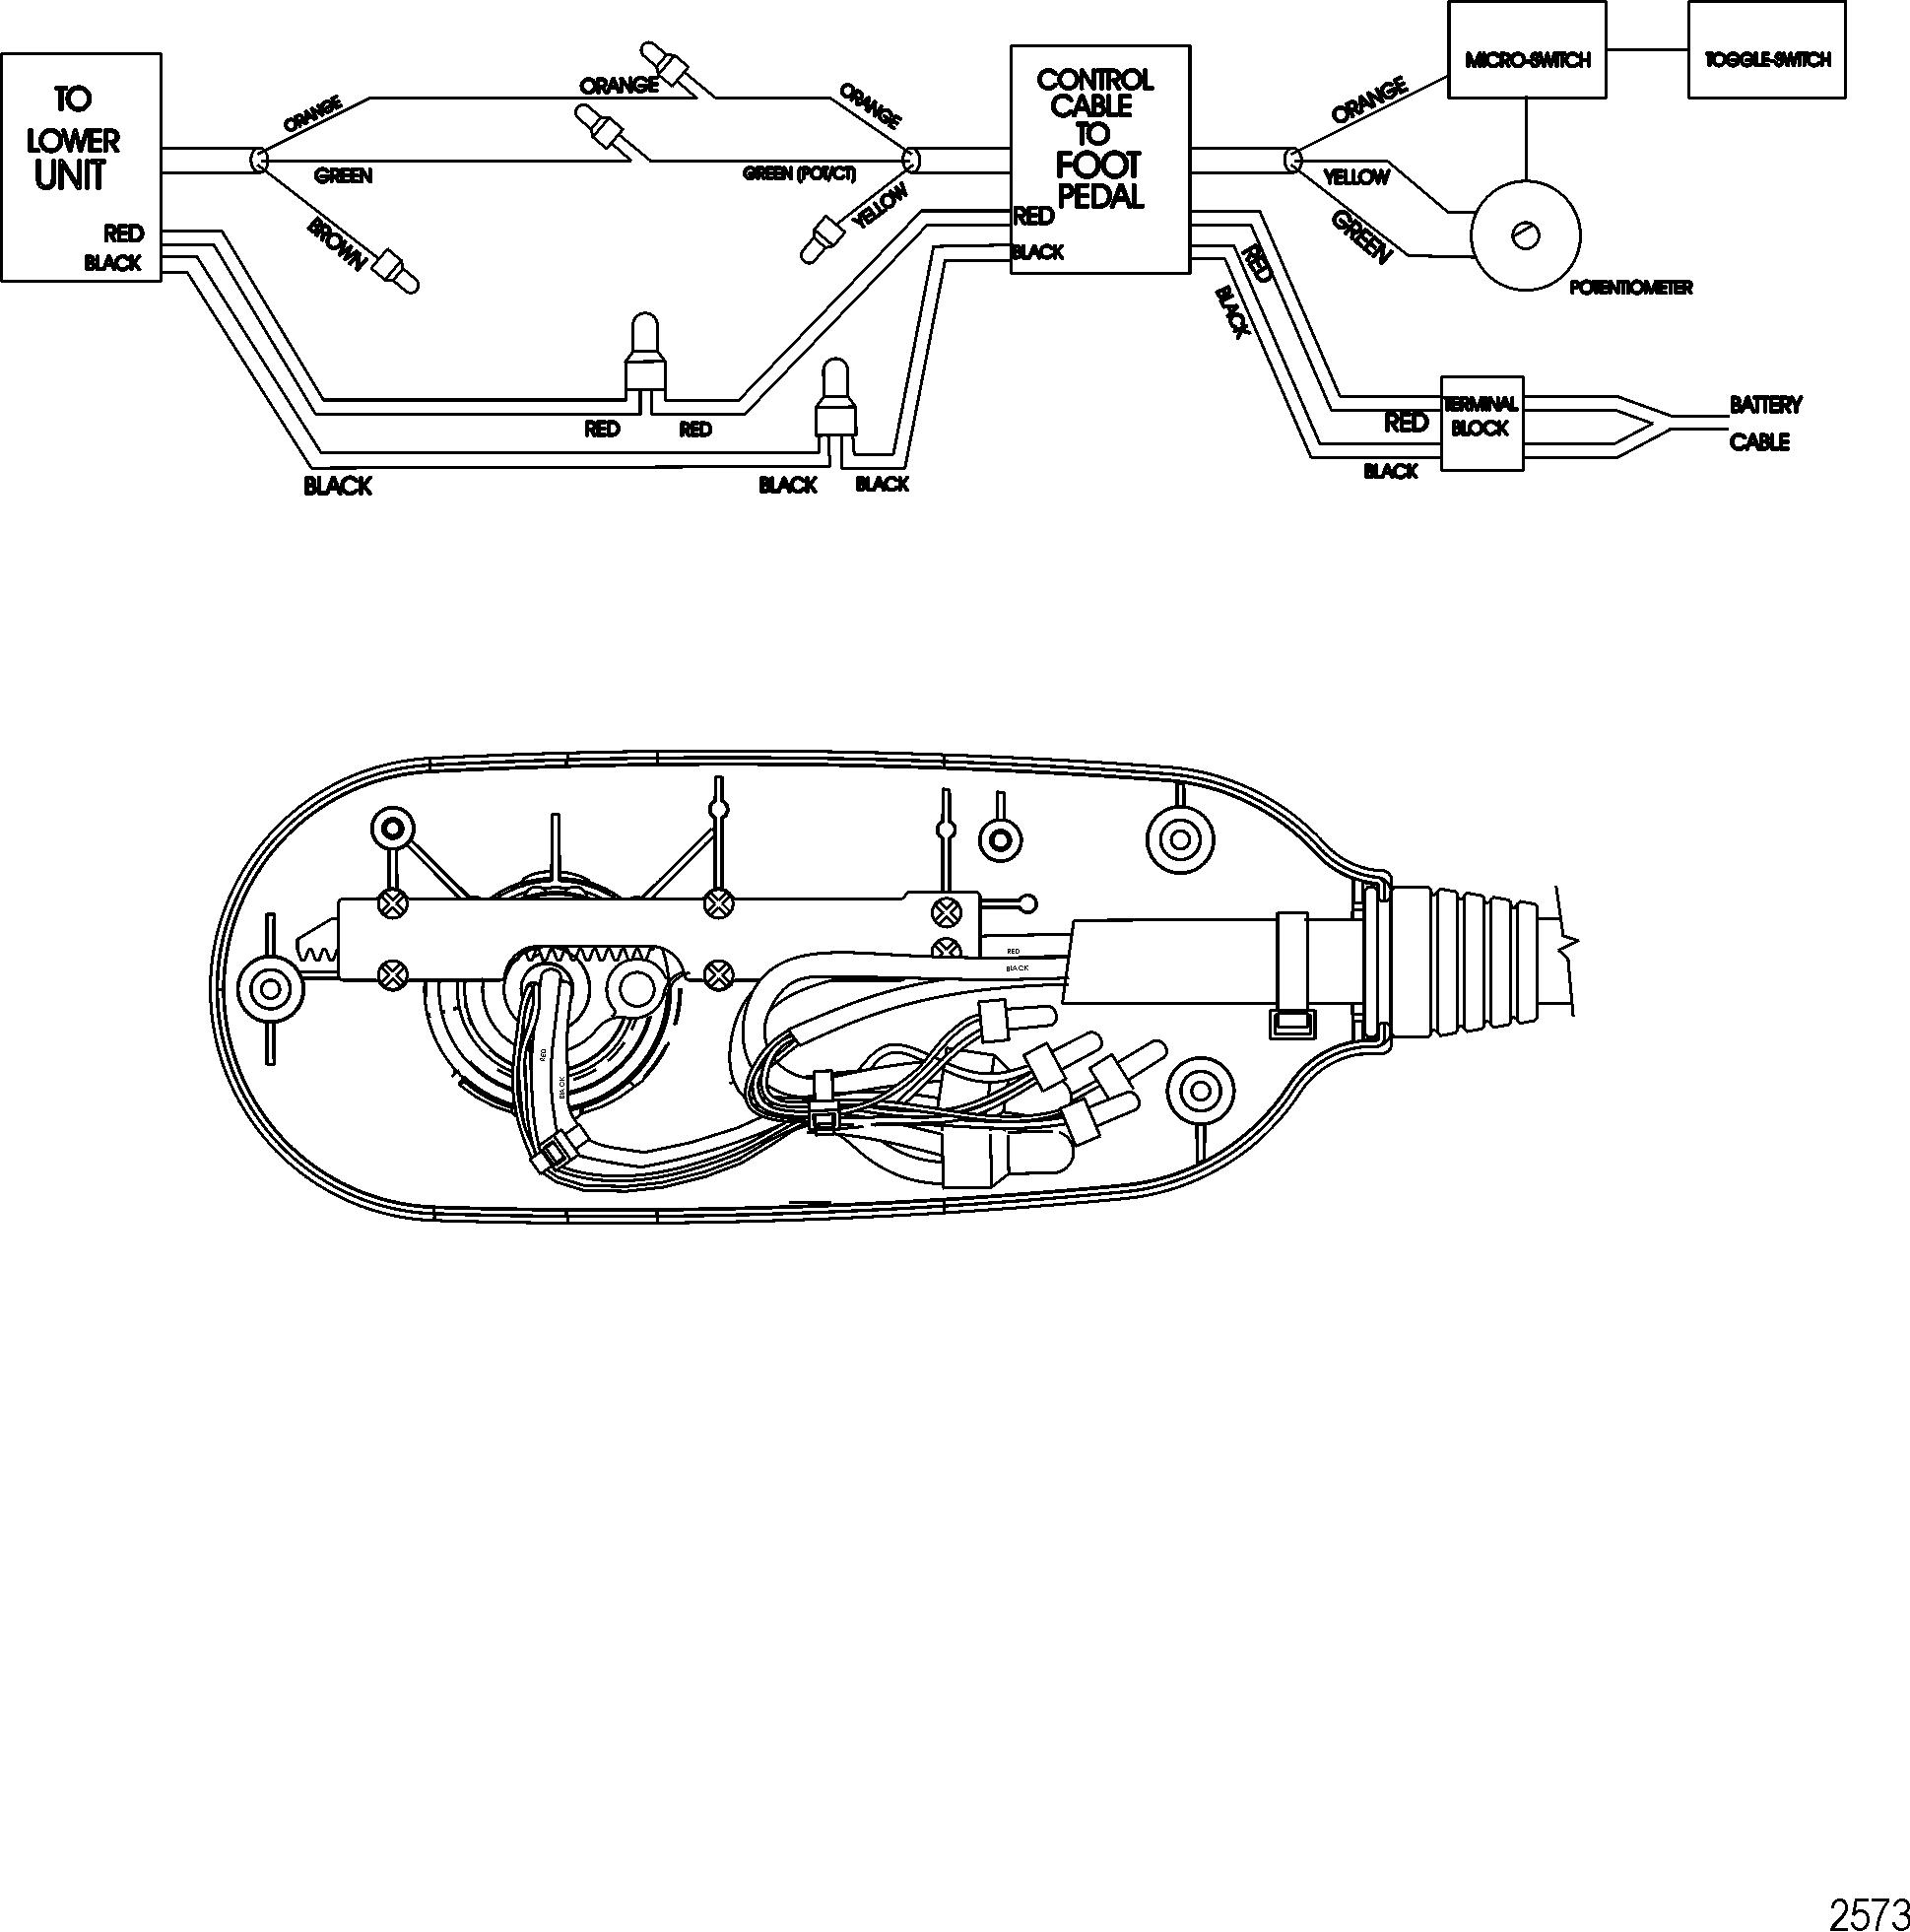 Wiring Diagram As Well 24 Volt Trolling Motor Wiring Diagram On Boat